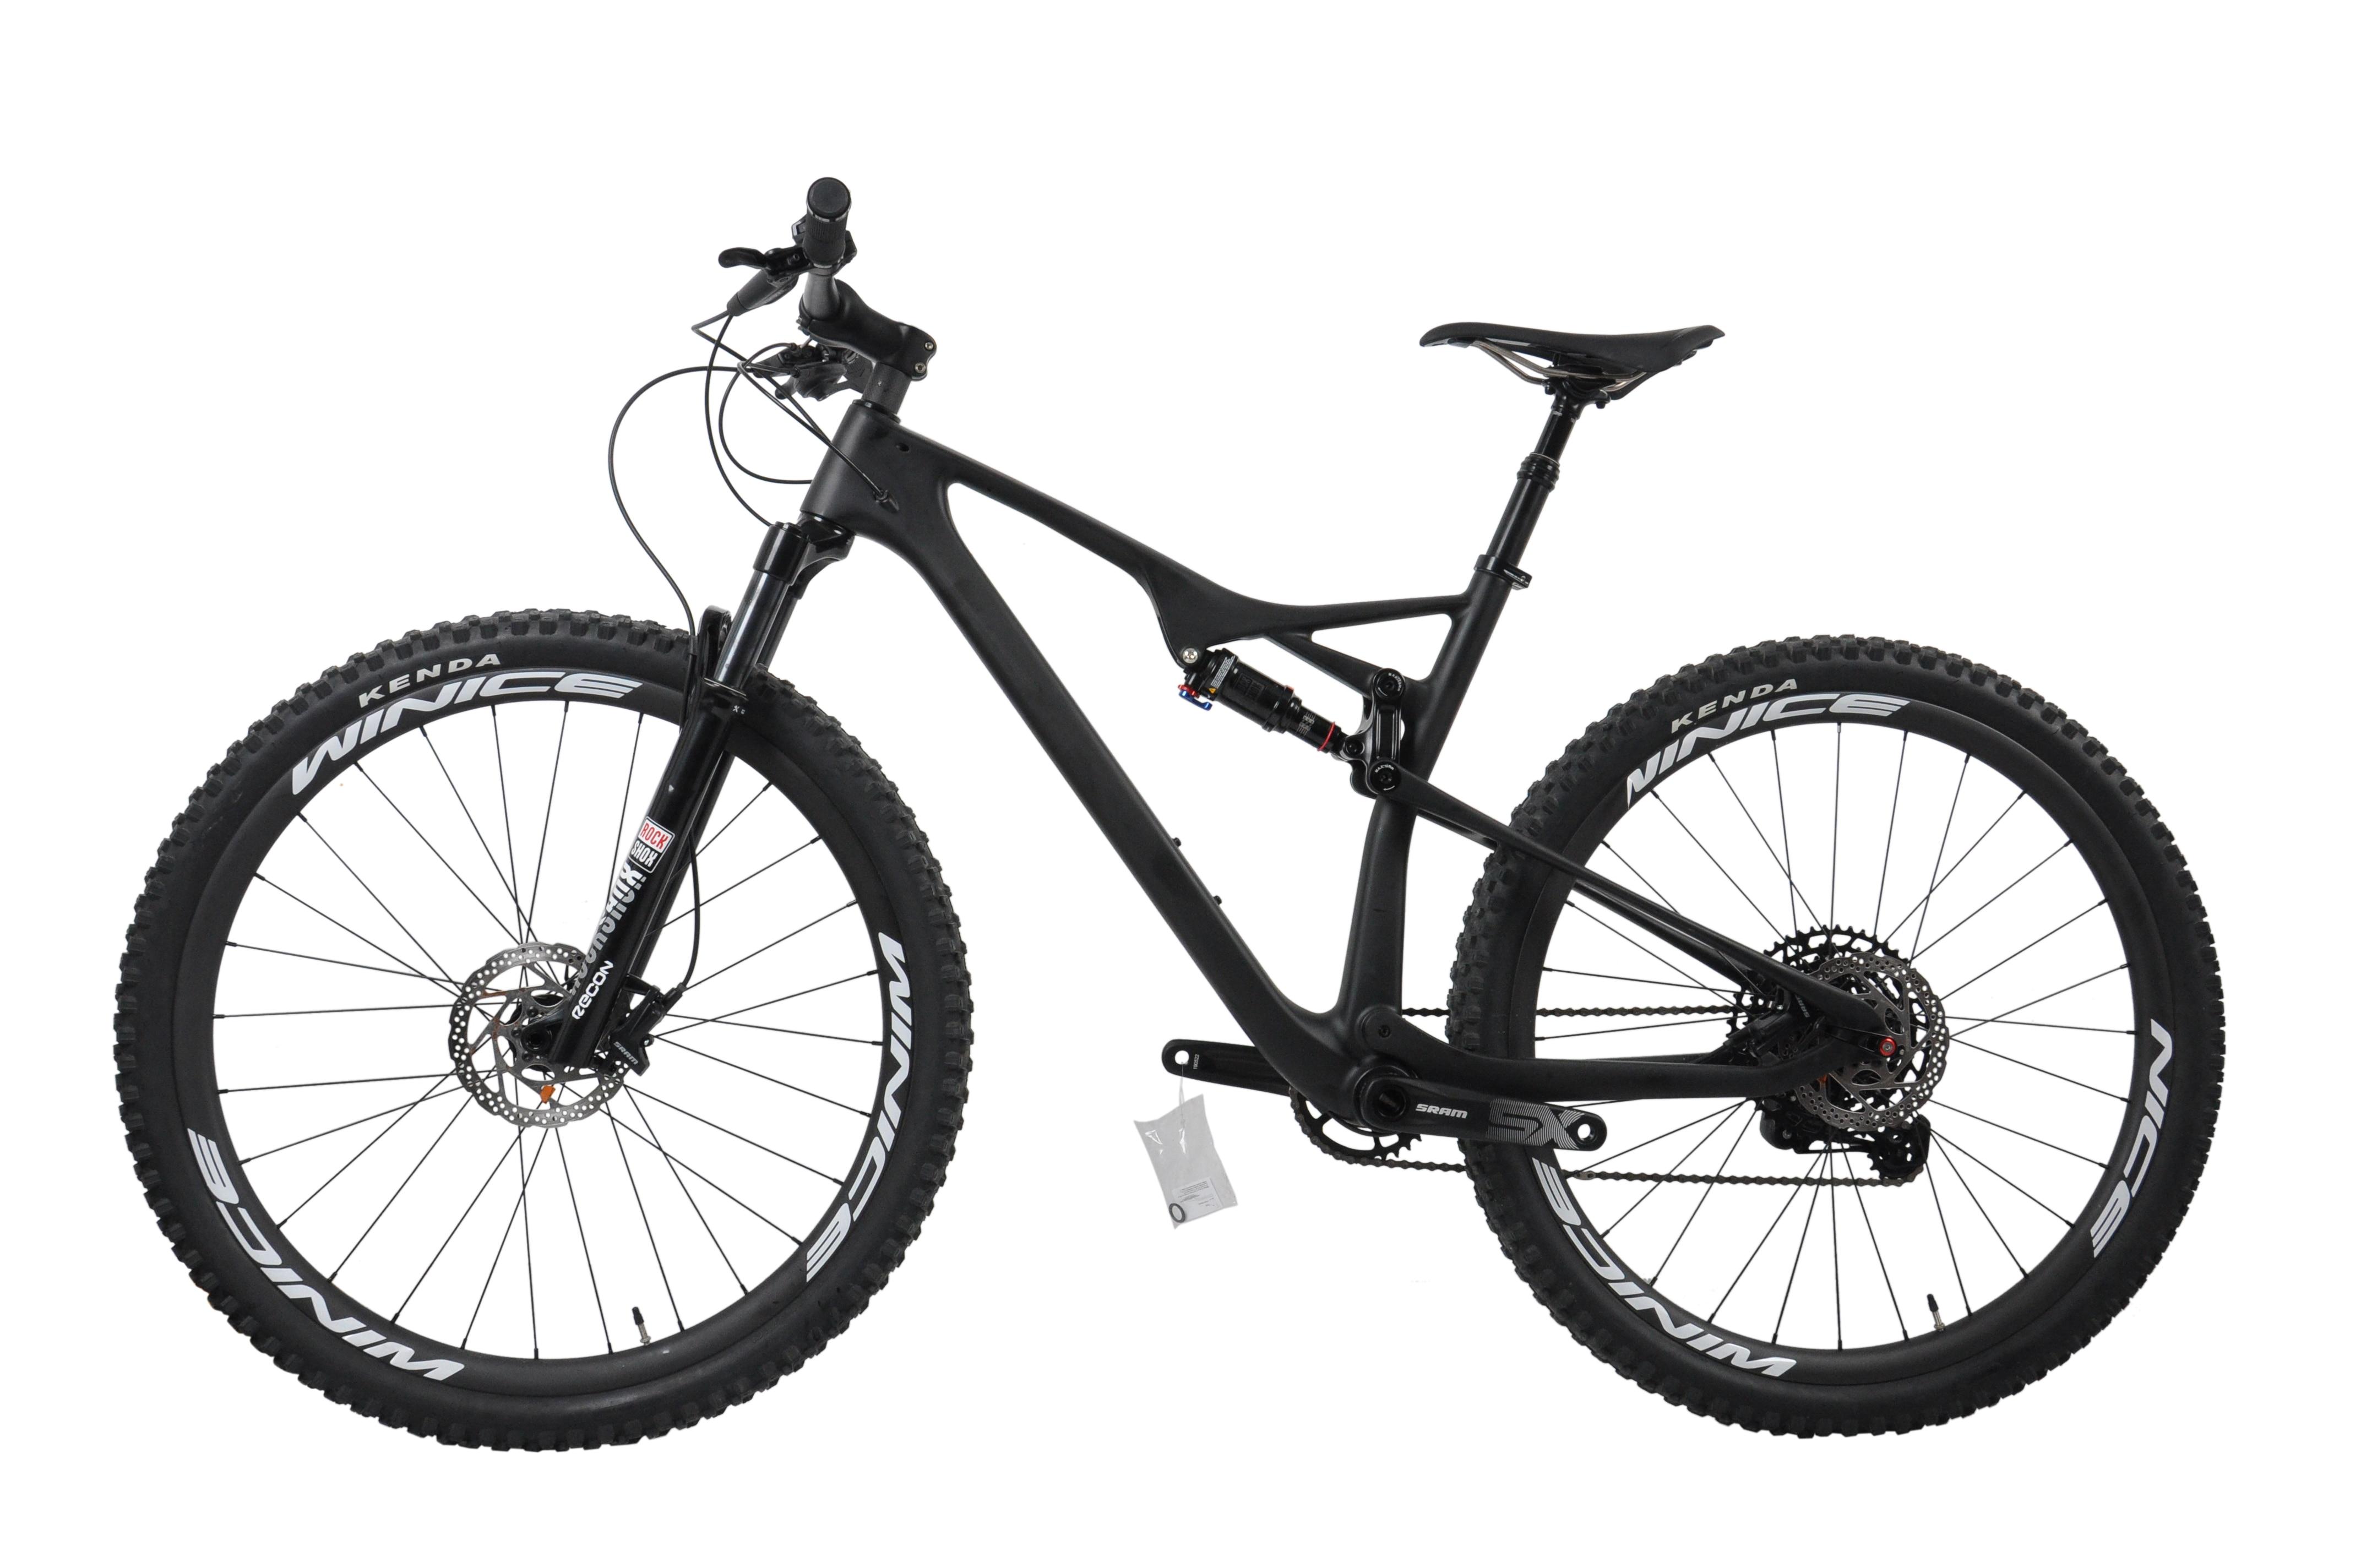 XC full suspension fahrrad Fahrzeug 29er 27,5 plus 29boost 100 x15mm steckachse 148x12mm boost bicicleta